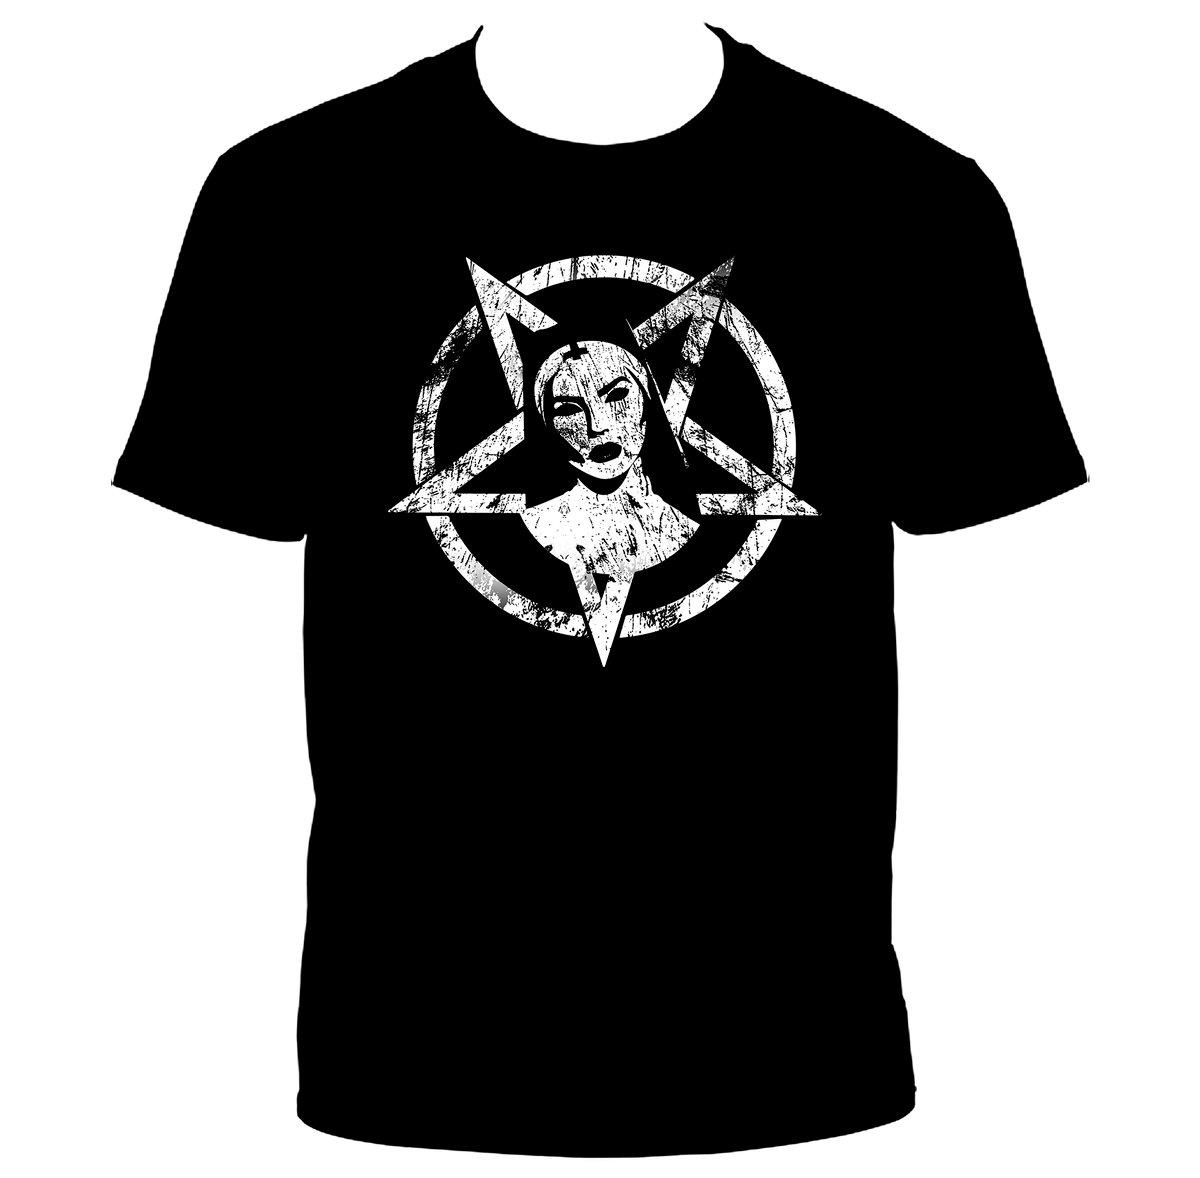 Image of [PRE-ORDER] Official Satanic Nun T-shirt